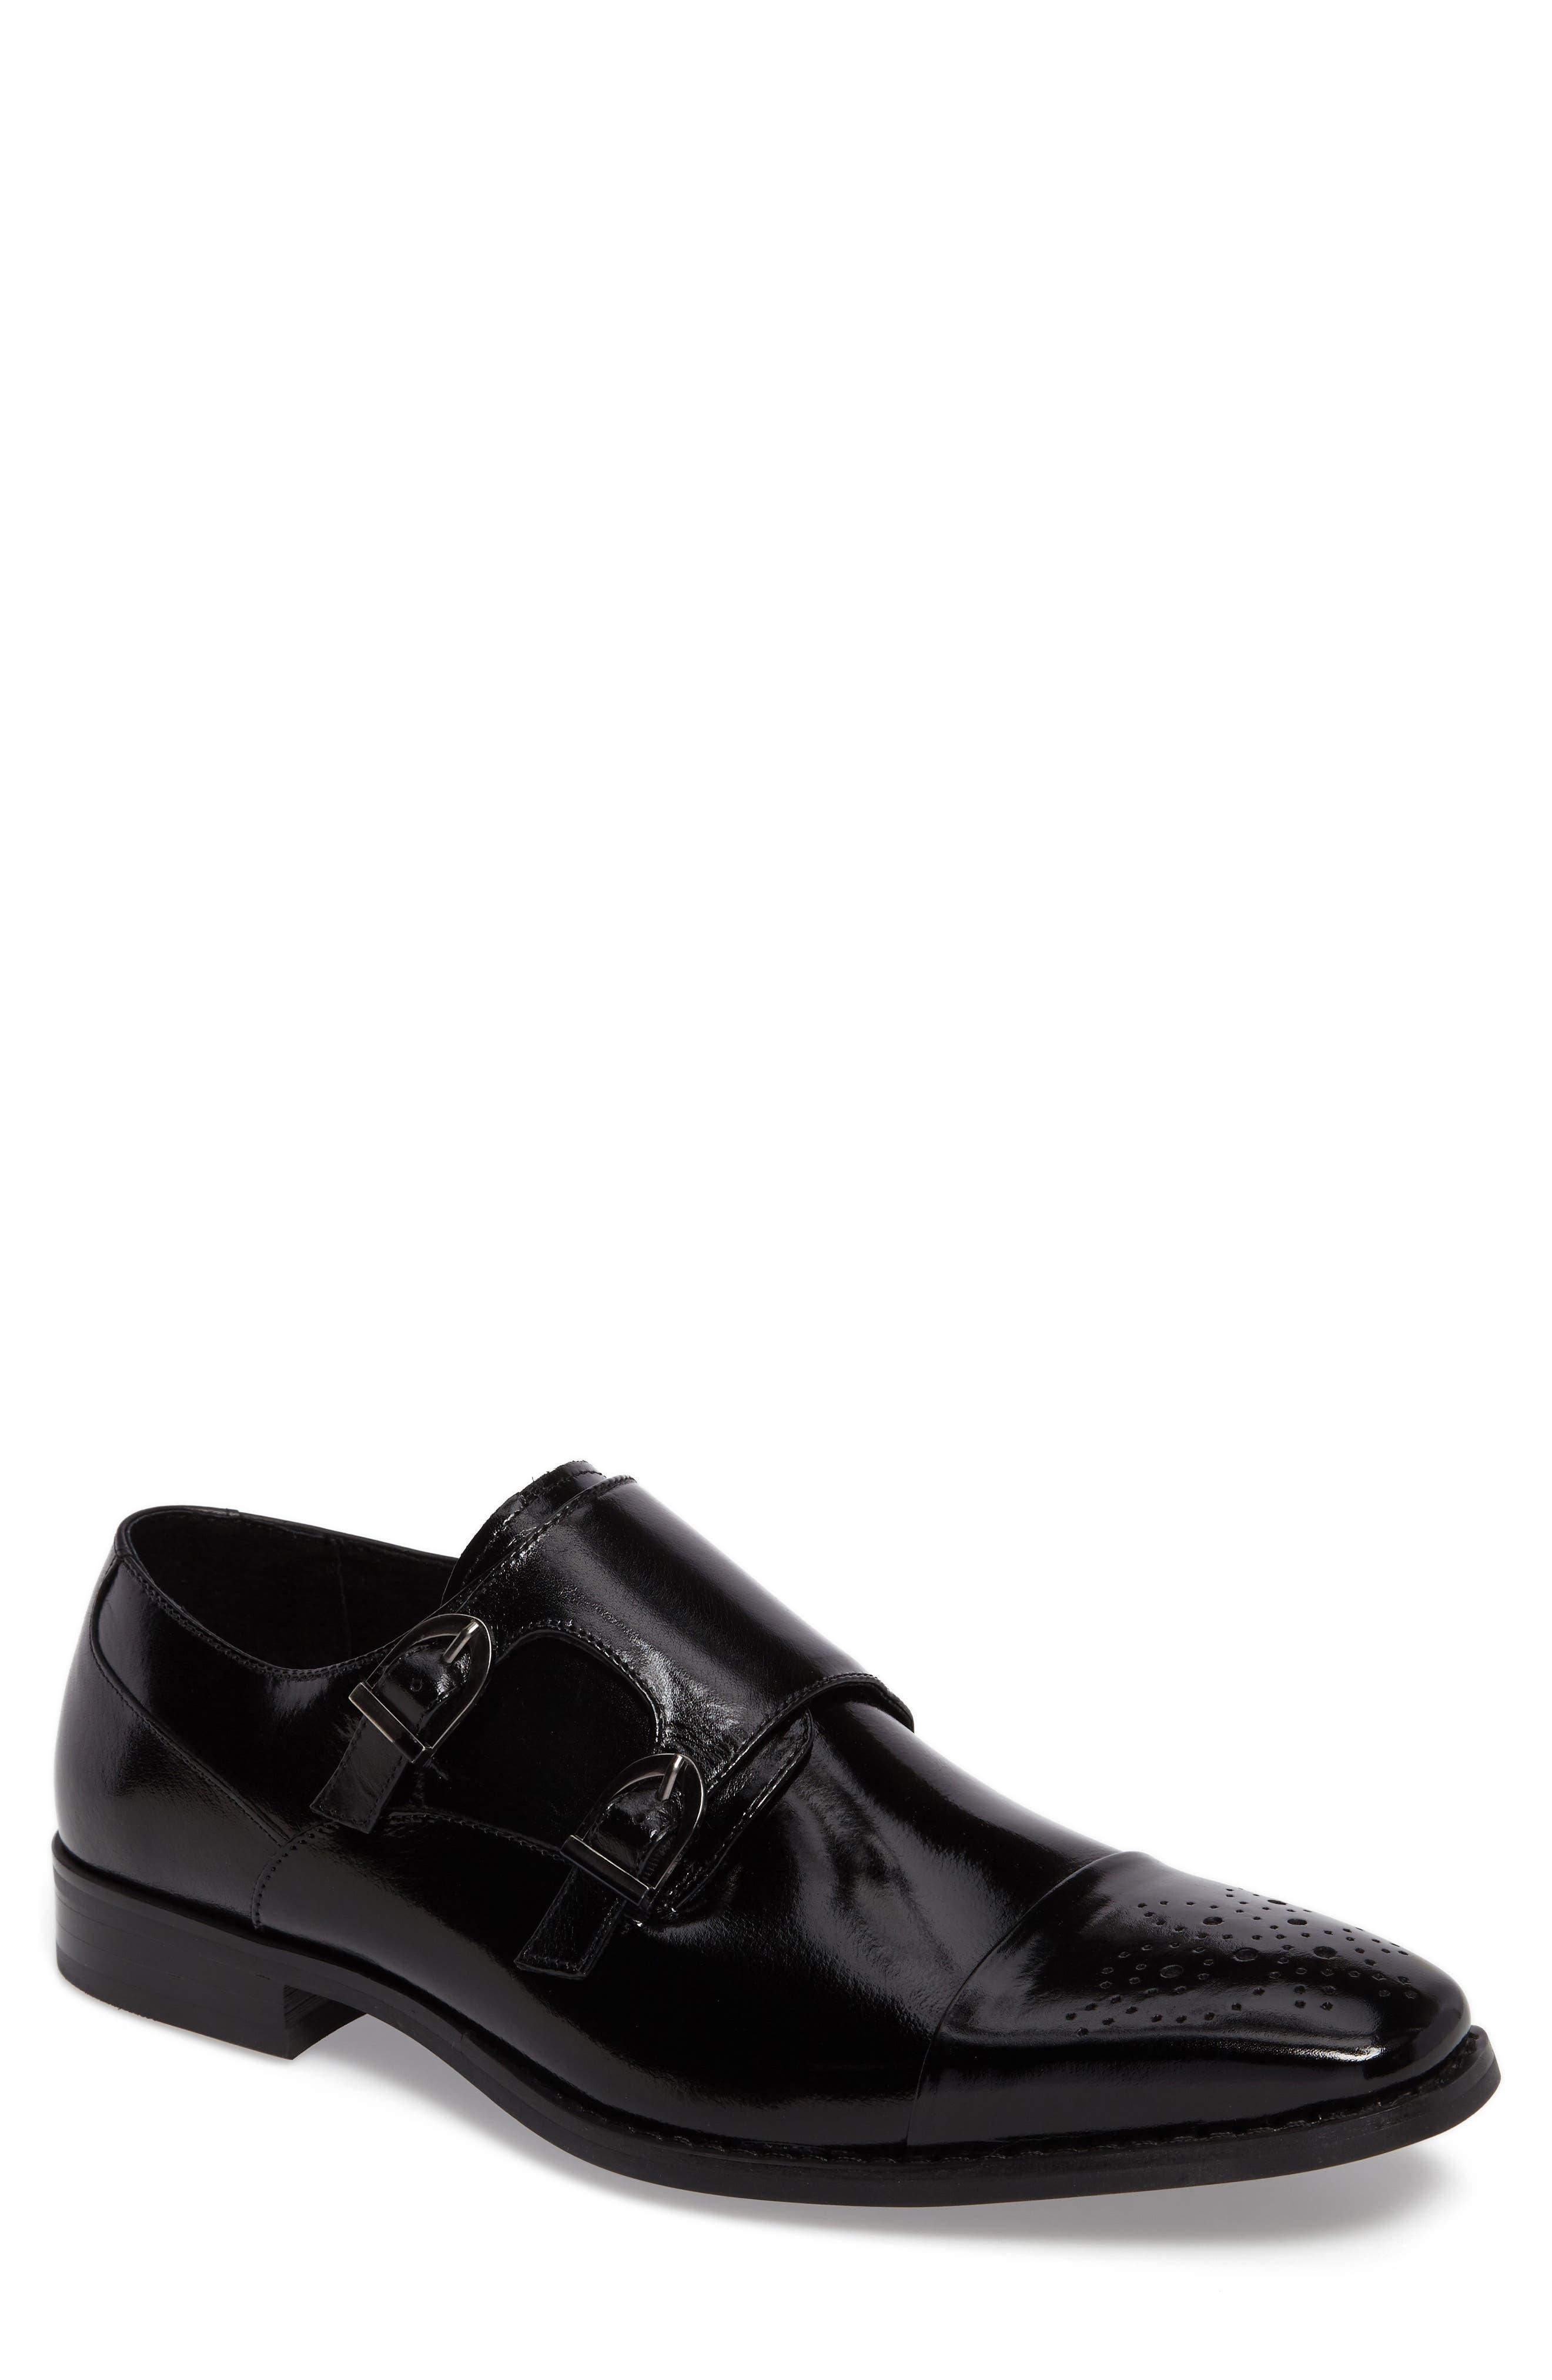 Main Image - Stacy Adams Trevor Double Monk Strap Shoe (Men)